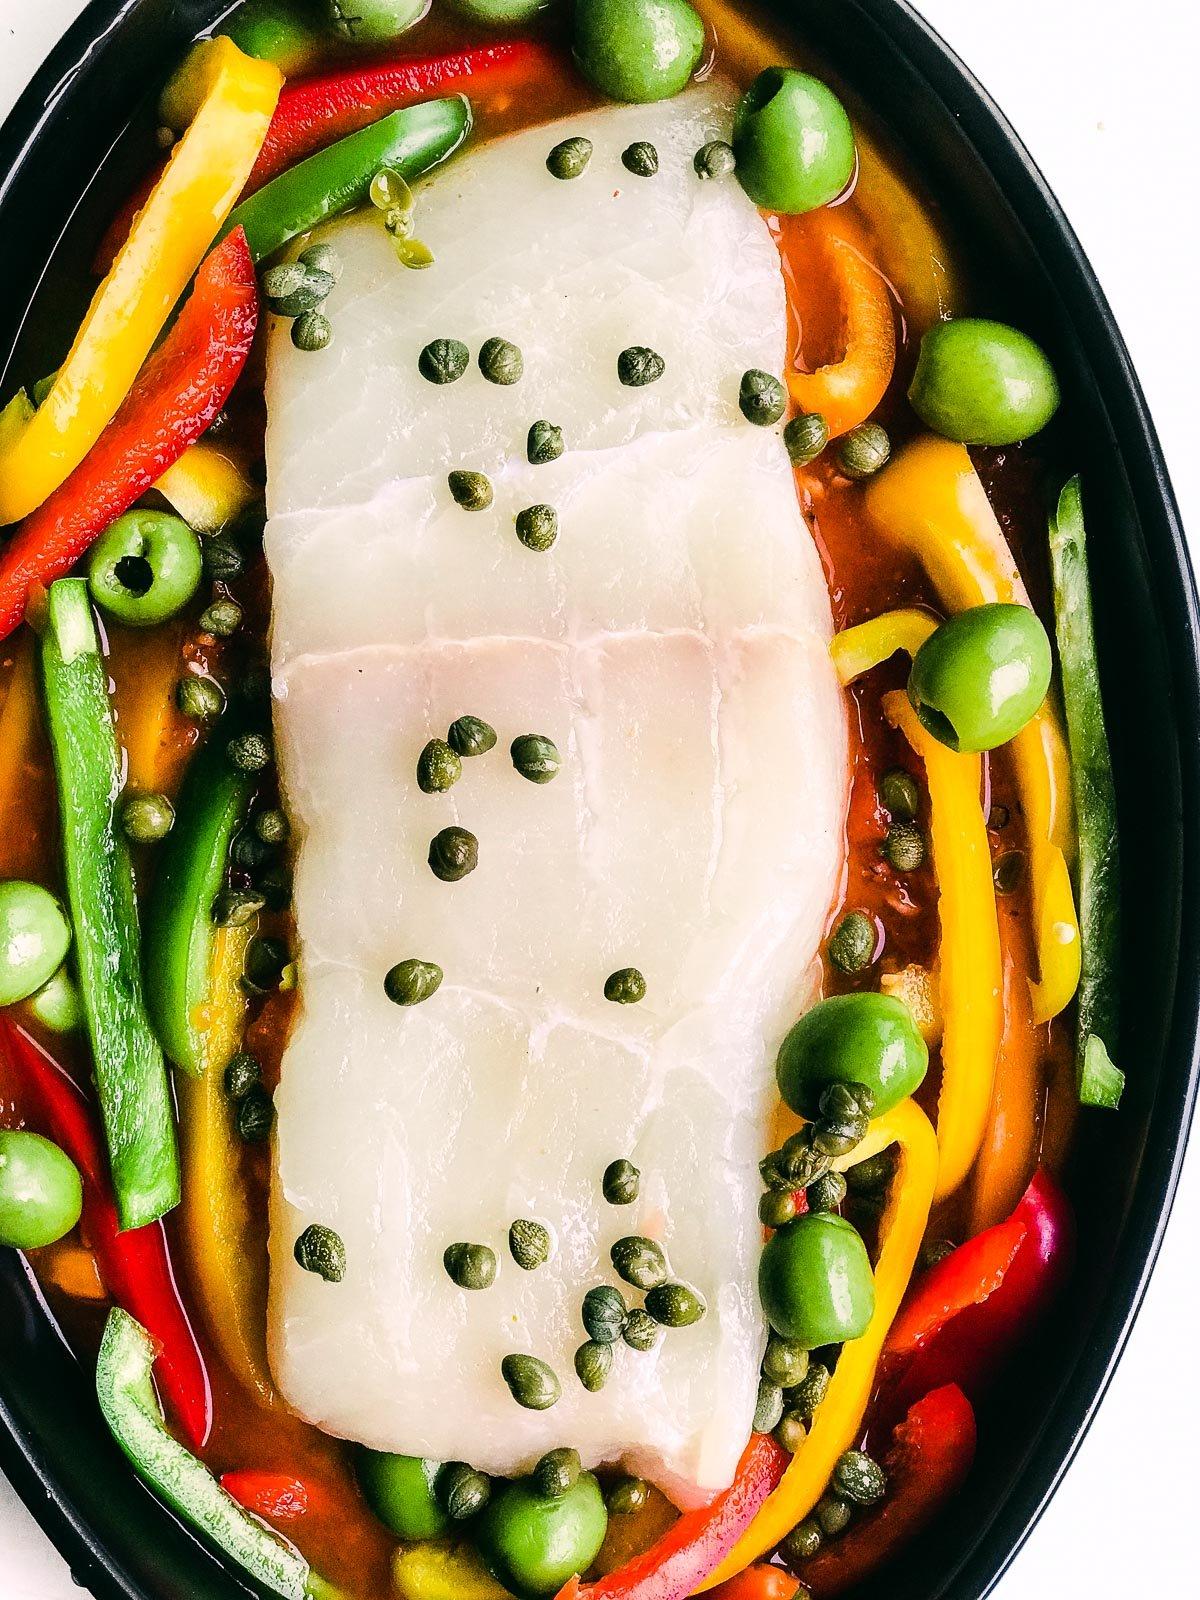 assembling roasted halibut with Mediterranean veggies